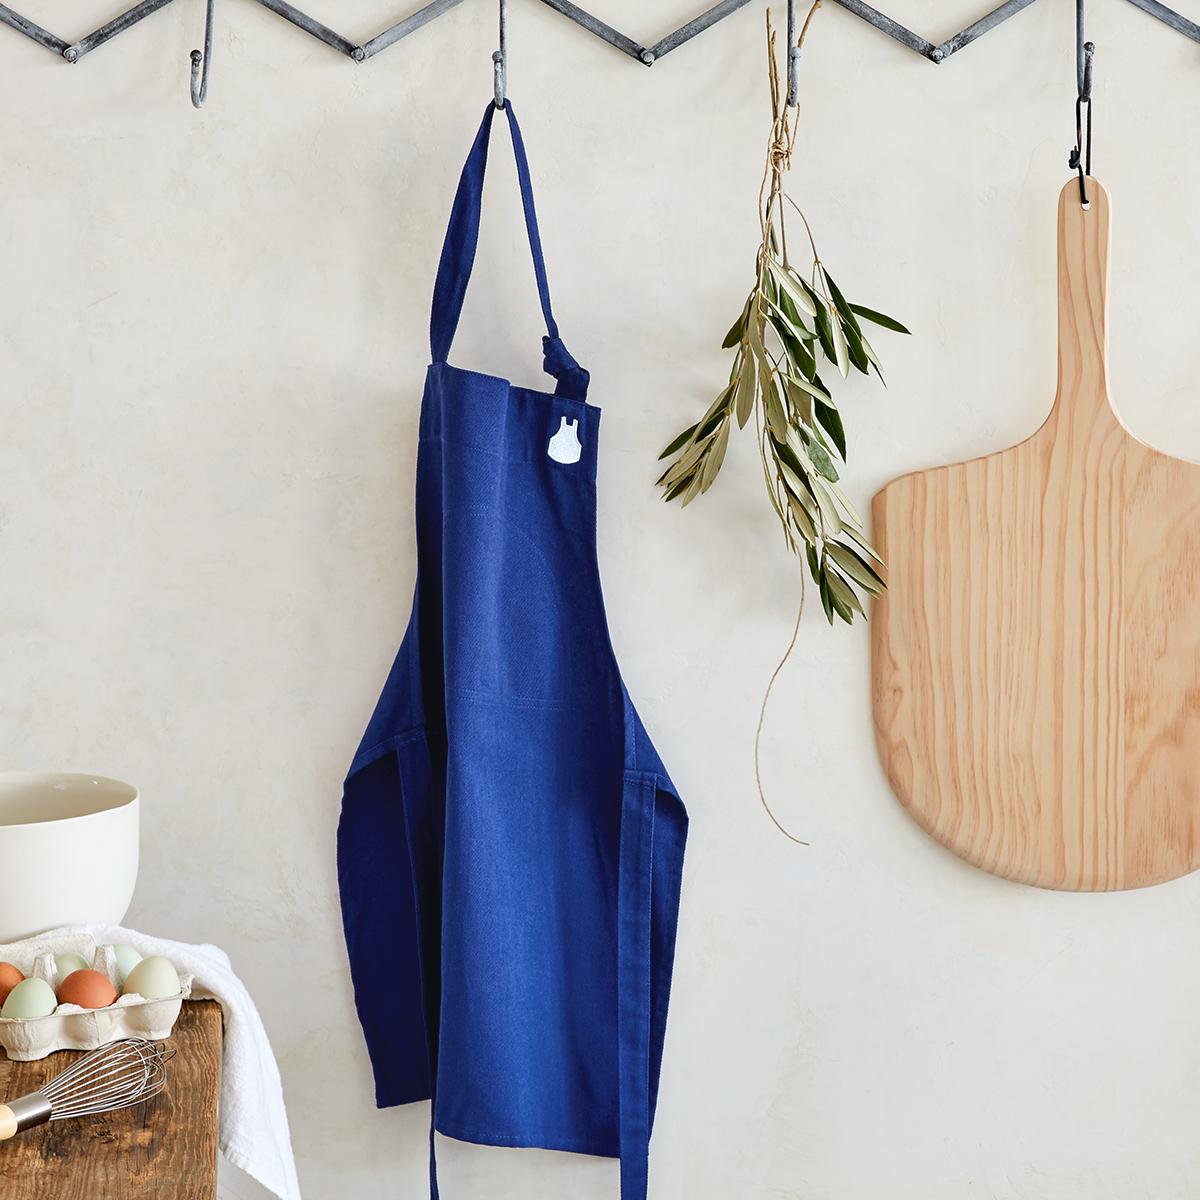 Blue apron llc - Check Out The Children S Blue Apron Now Available At Blue Apron Market Https